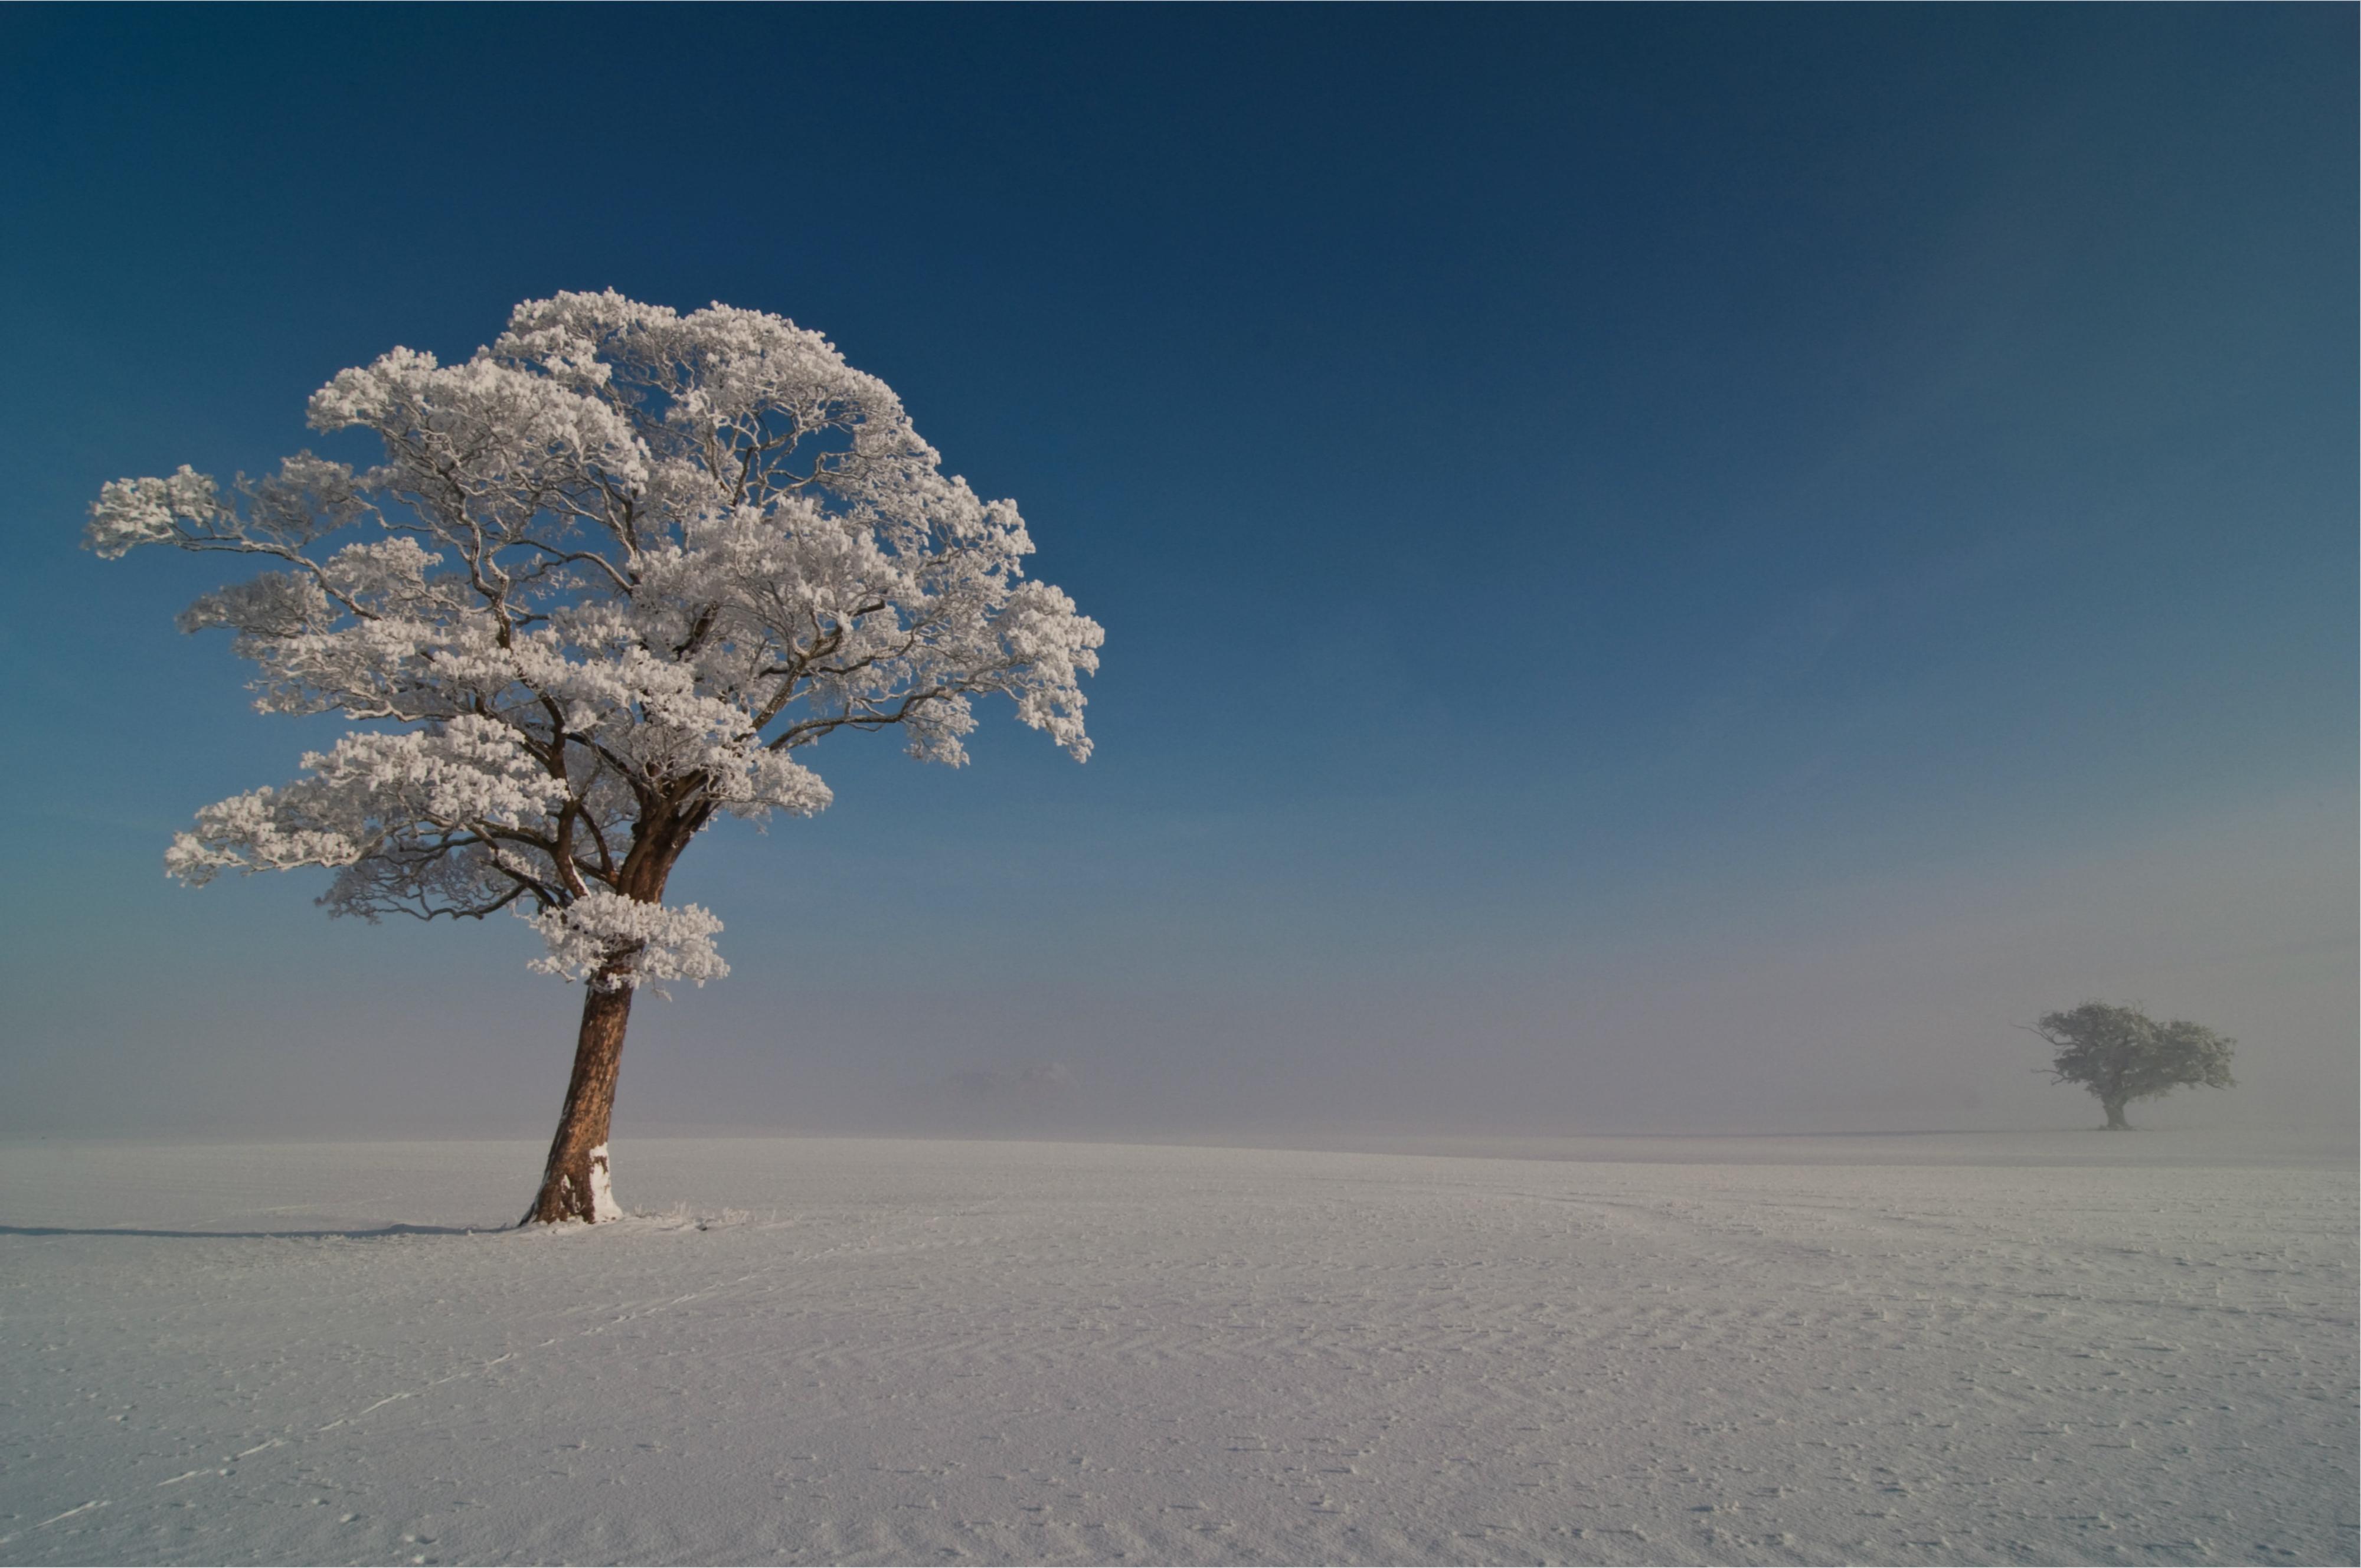 природа водопад снег небо облака зима скачать